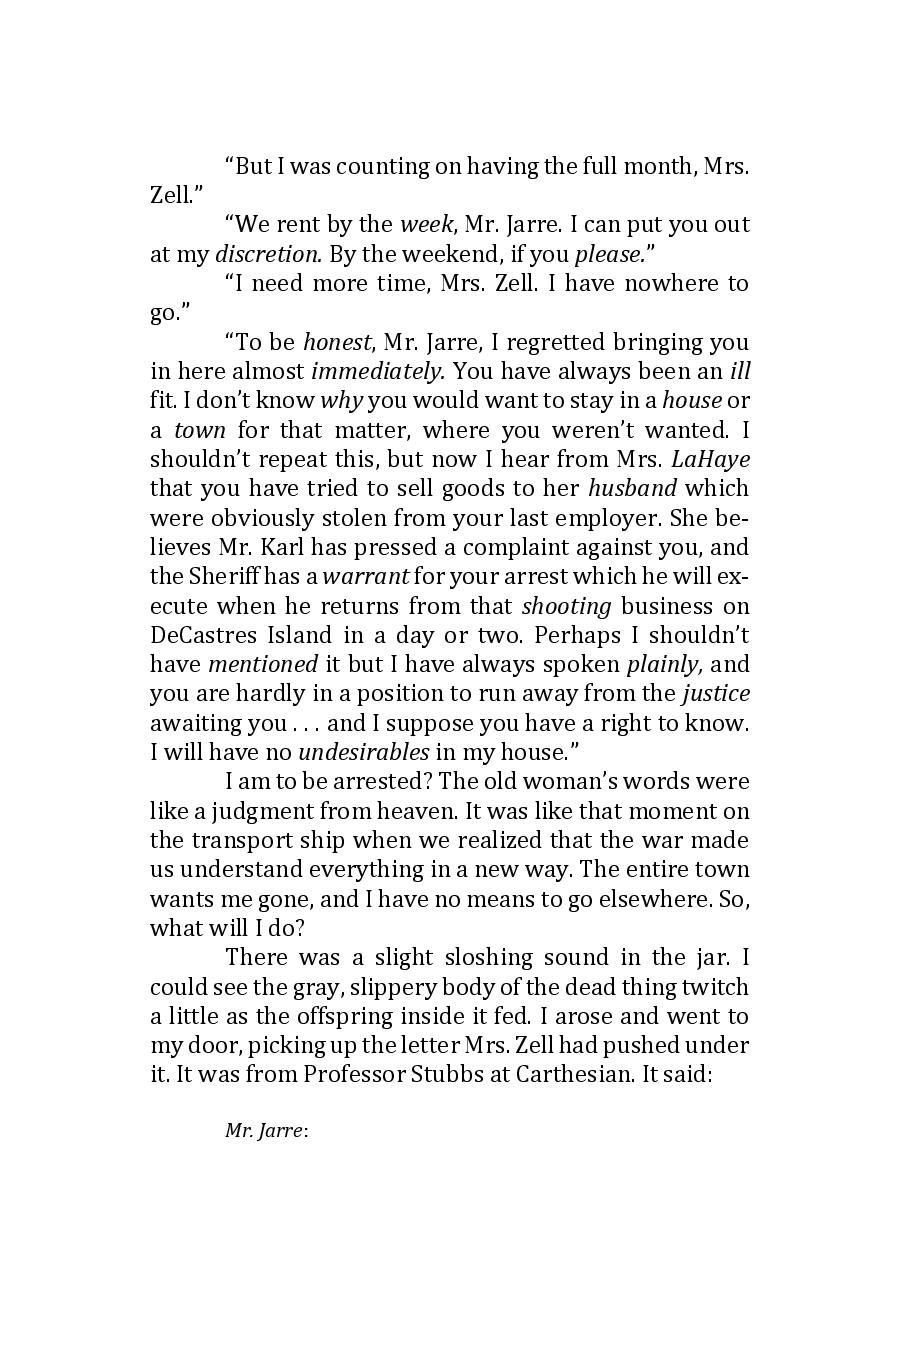 Hinnom Magazine 002 Manuscript E-Book 2-page-089